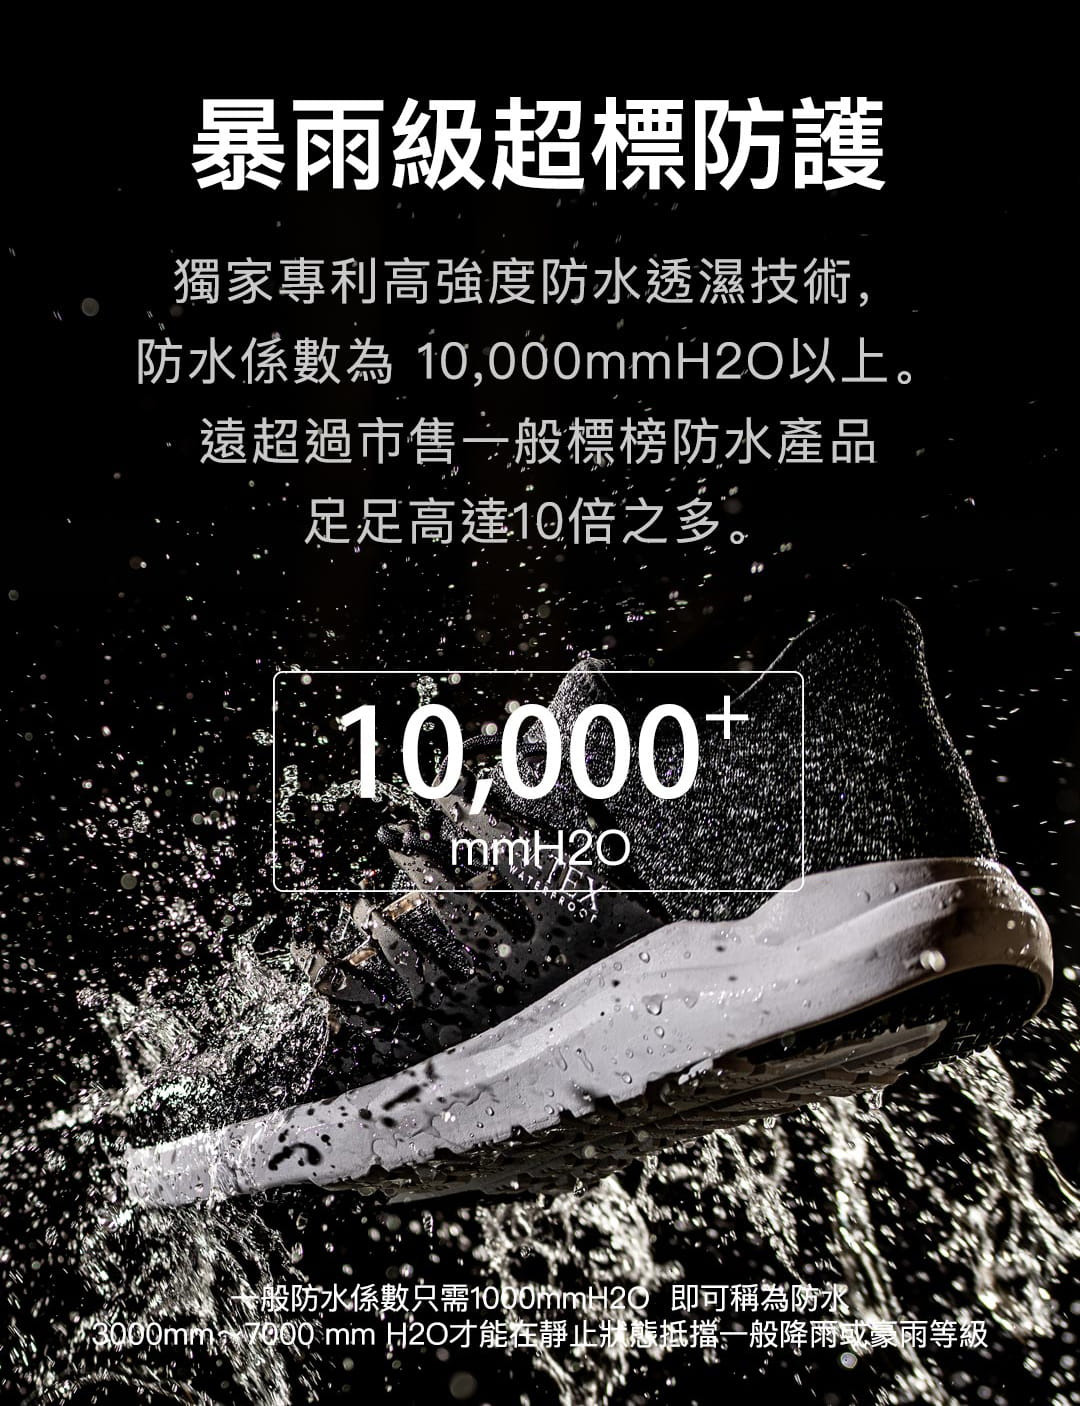 【V-TEX 地表最強防水鞋】【V-TEX機能防水鞋】 雙11優選款式 (3款任選) 12